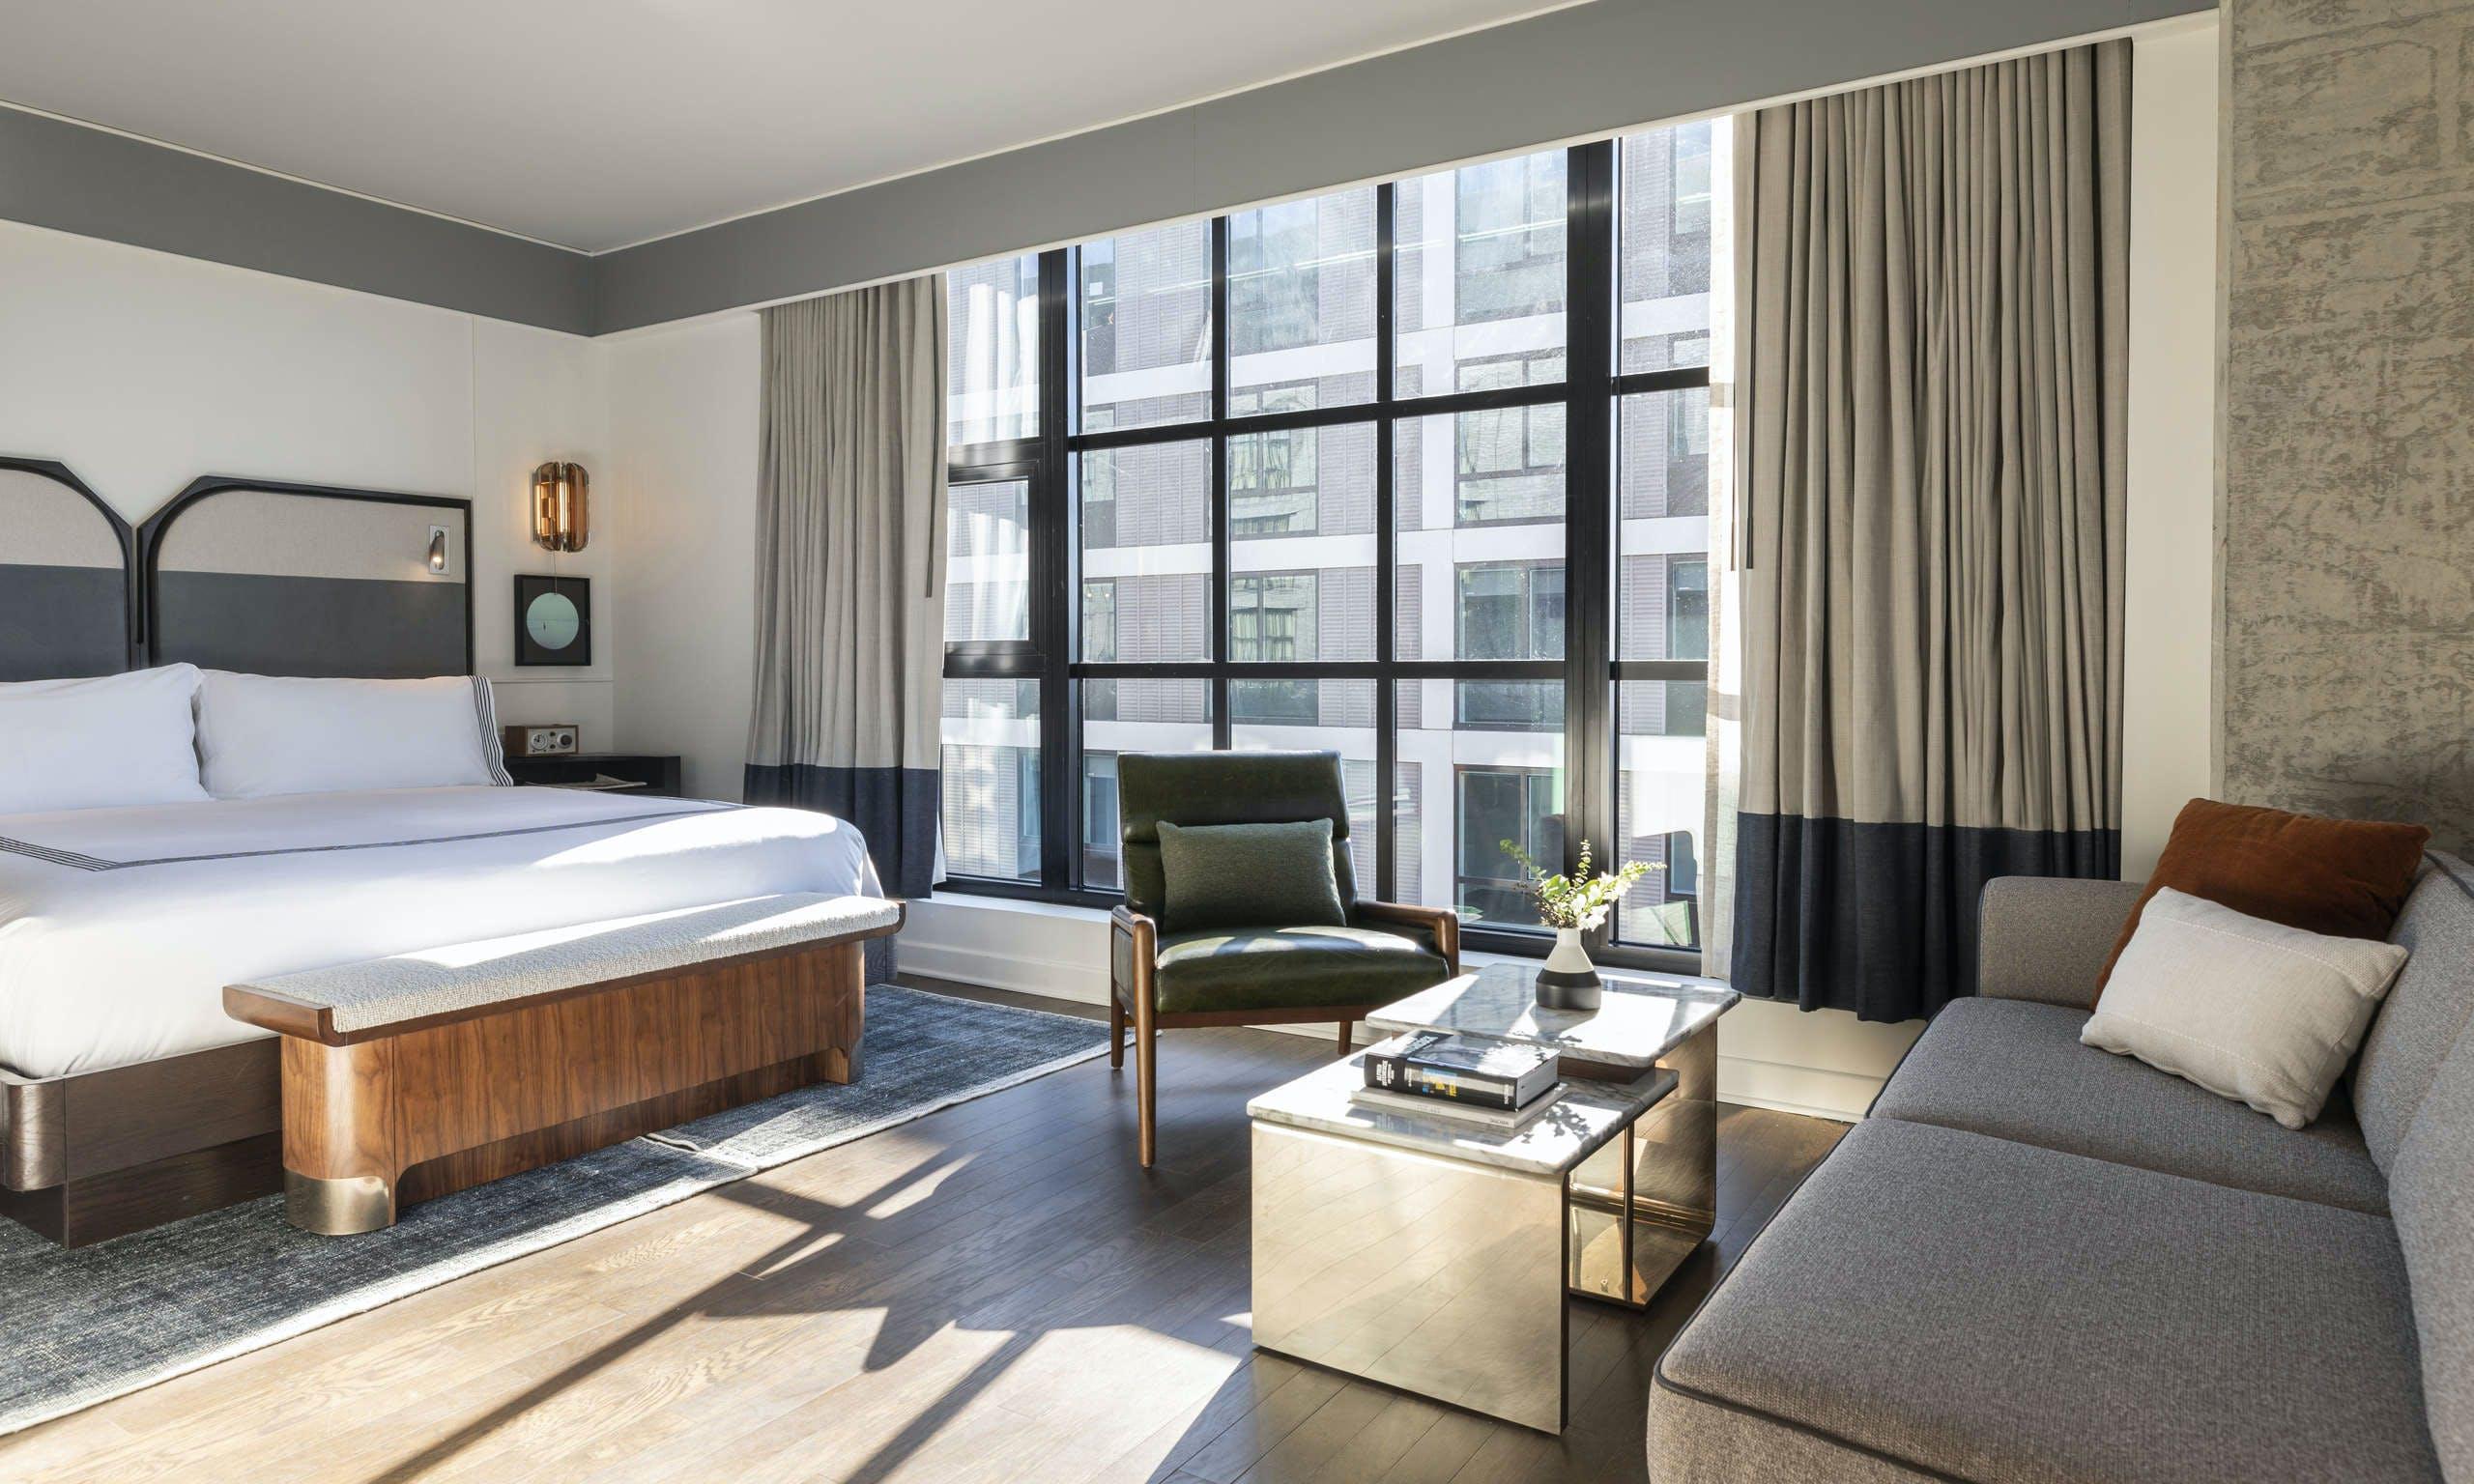 Cheap Last Minute Hotel Deals In Washington Dc From 86 Hoteltonight